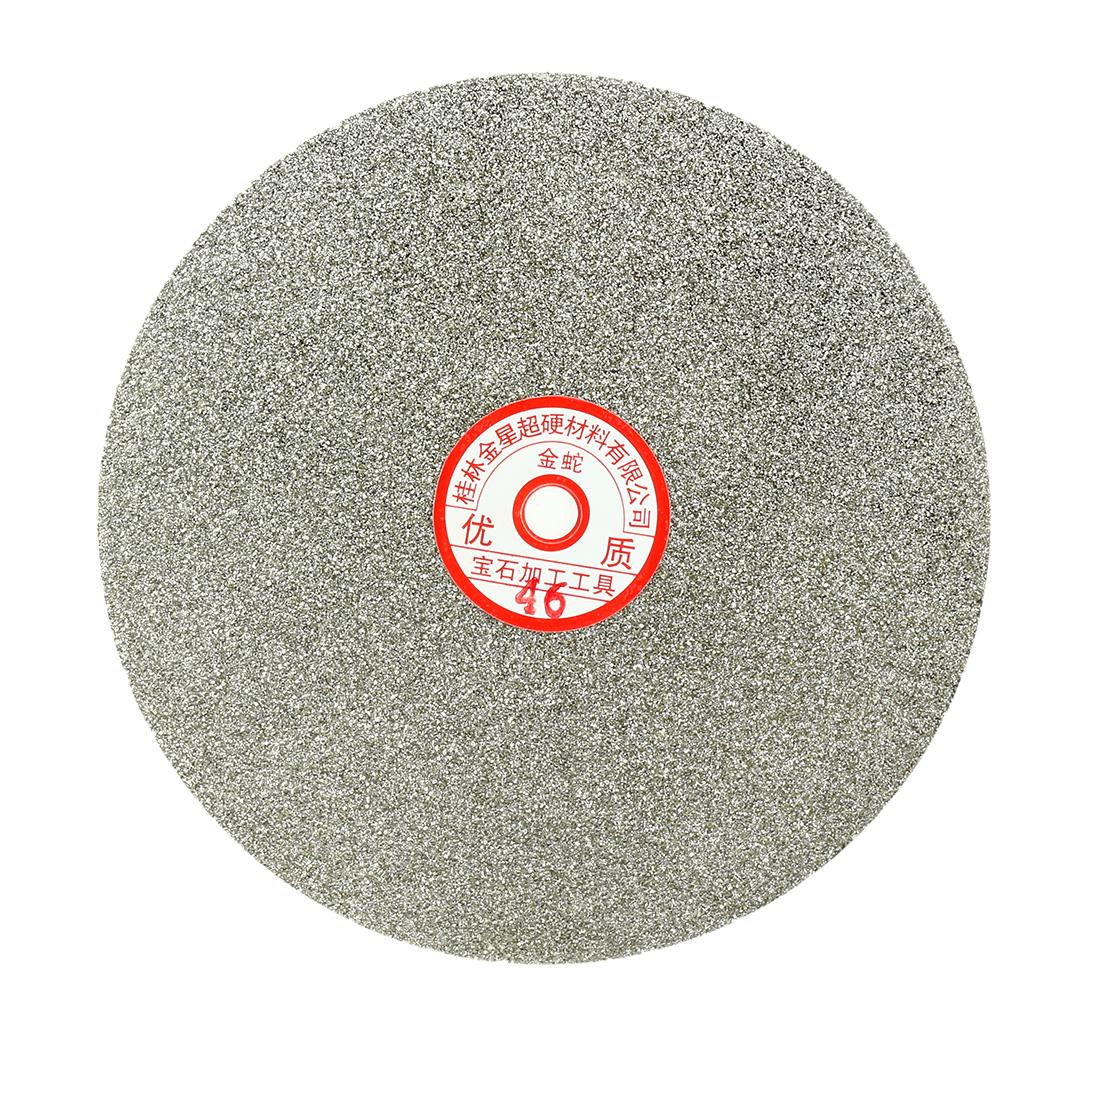 200mm 8-inch Grit 46 Diamond Coated Flat Lap Disk Wheel Grinding Sanding Disc